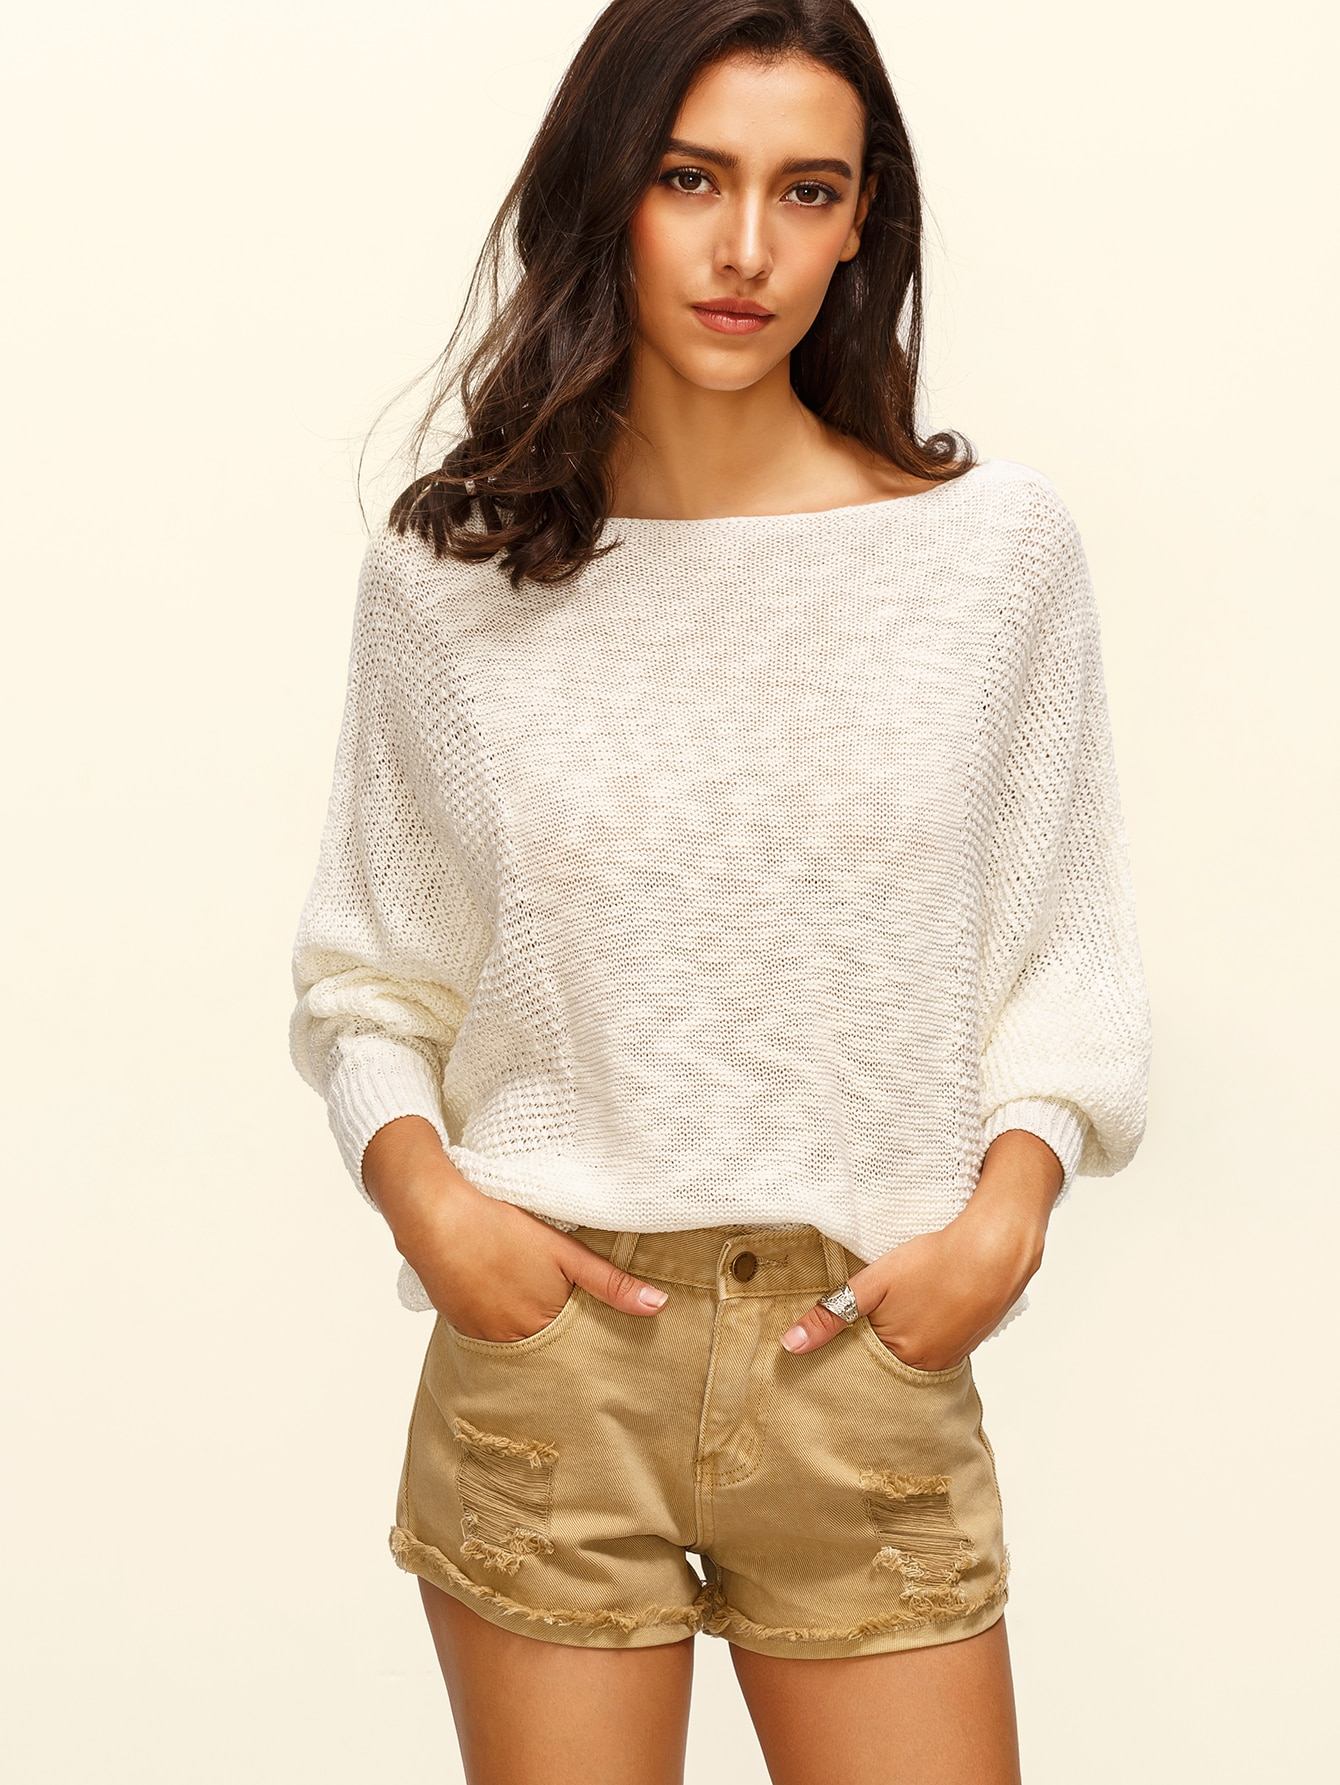 sweater160801724_2